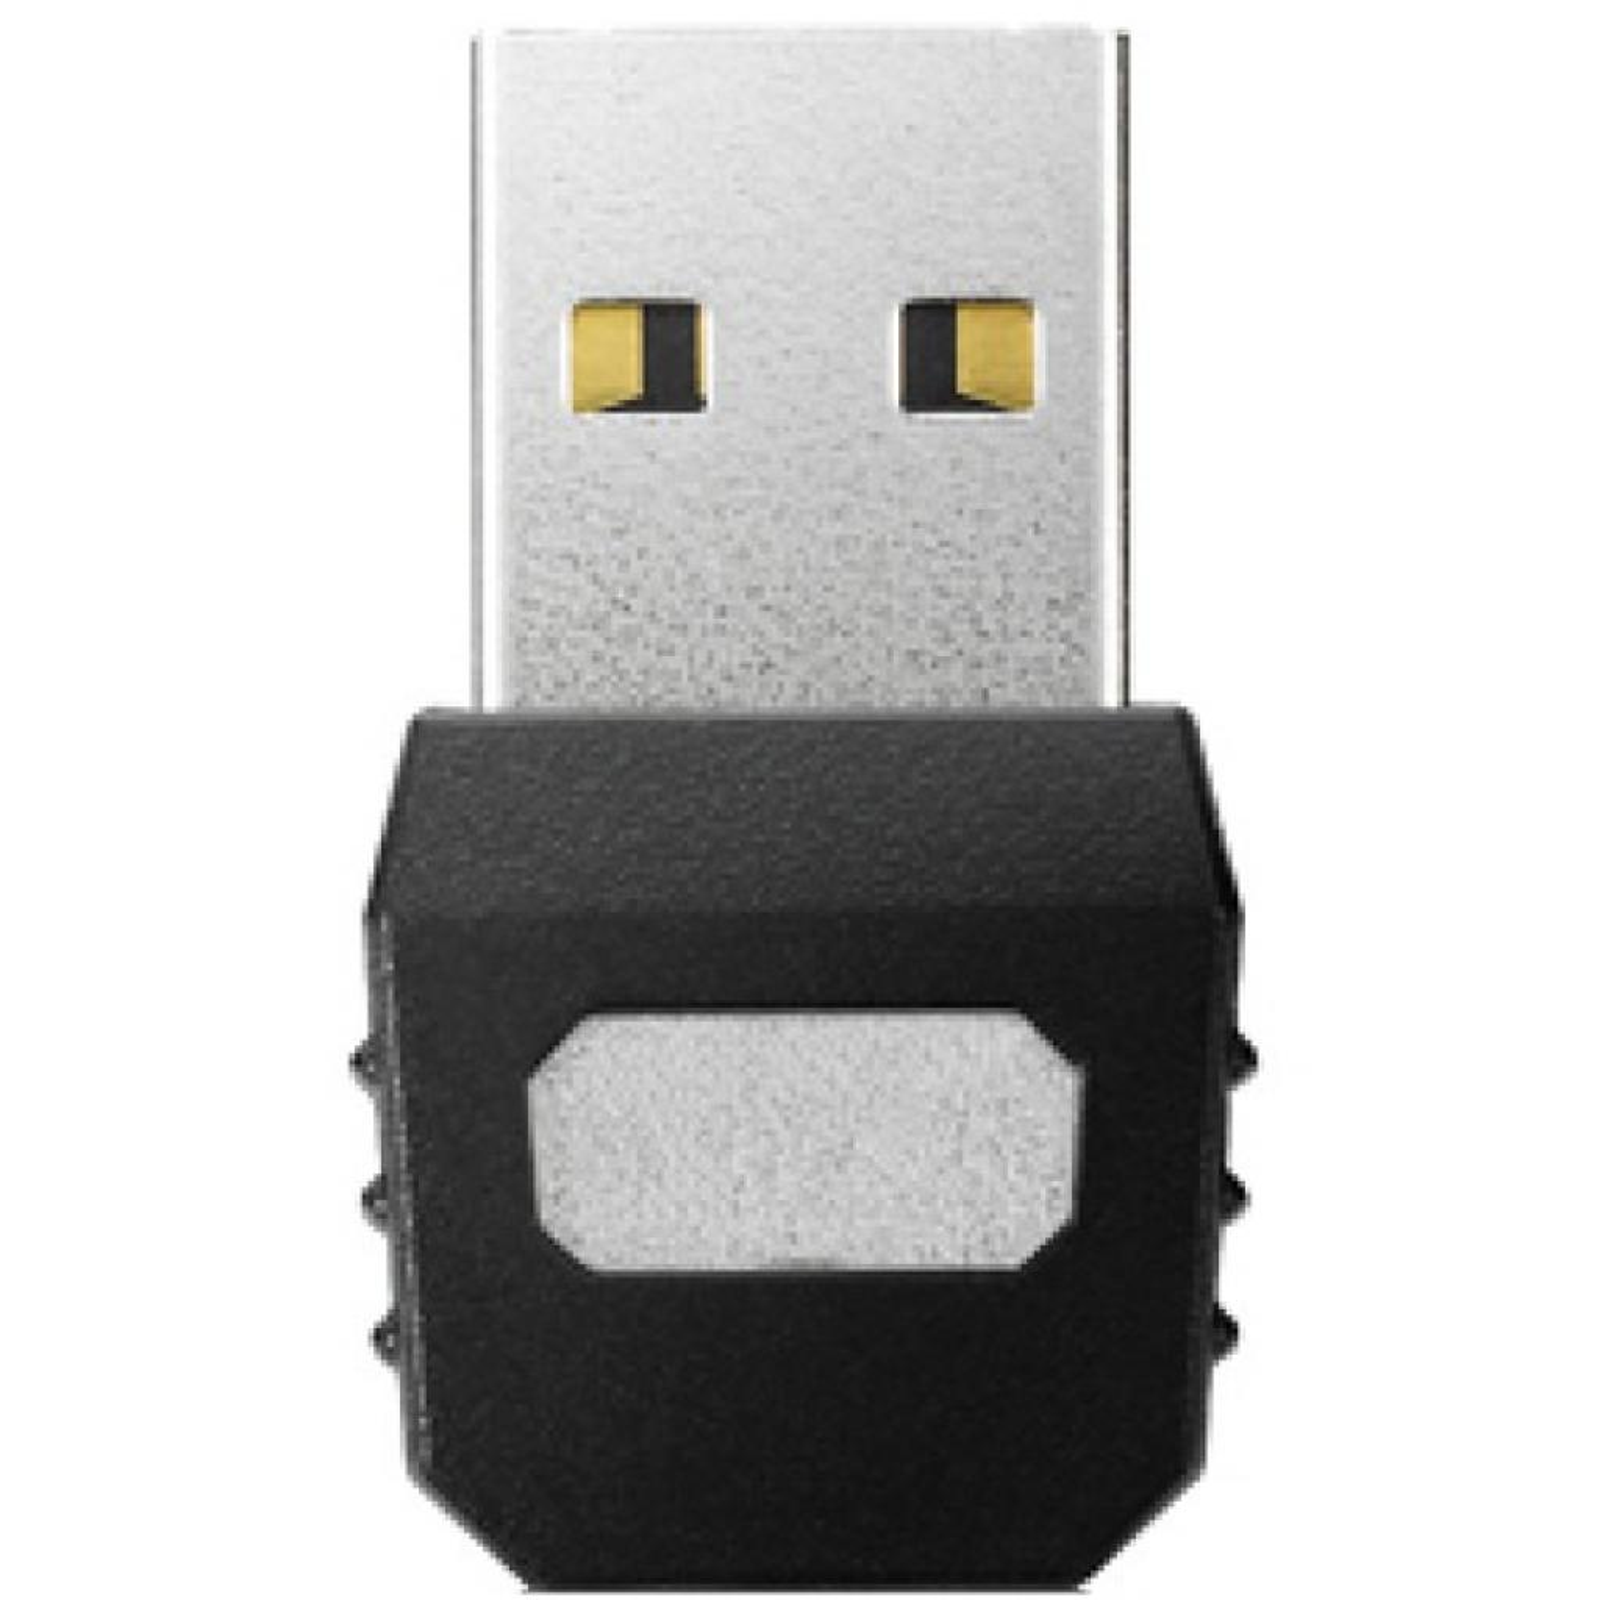 USB флеш накопитель 8GB AH134 Black RP USB2.0 Apacer (AP8GAH134B-1)